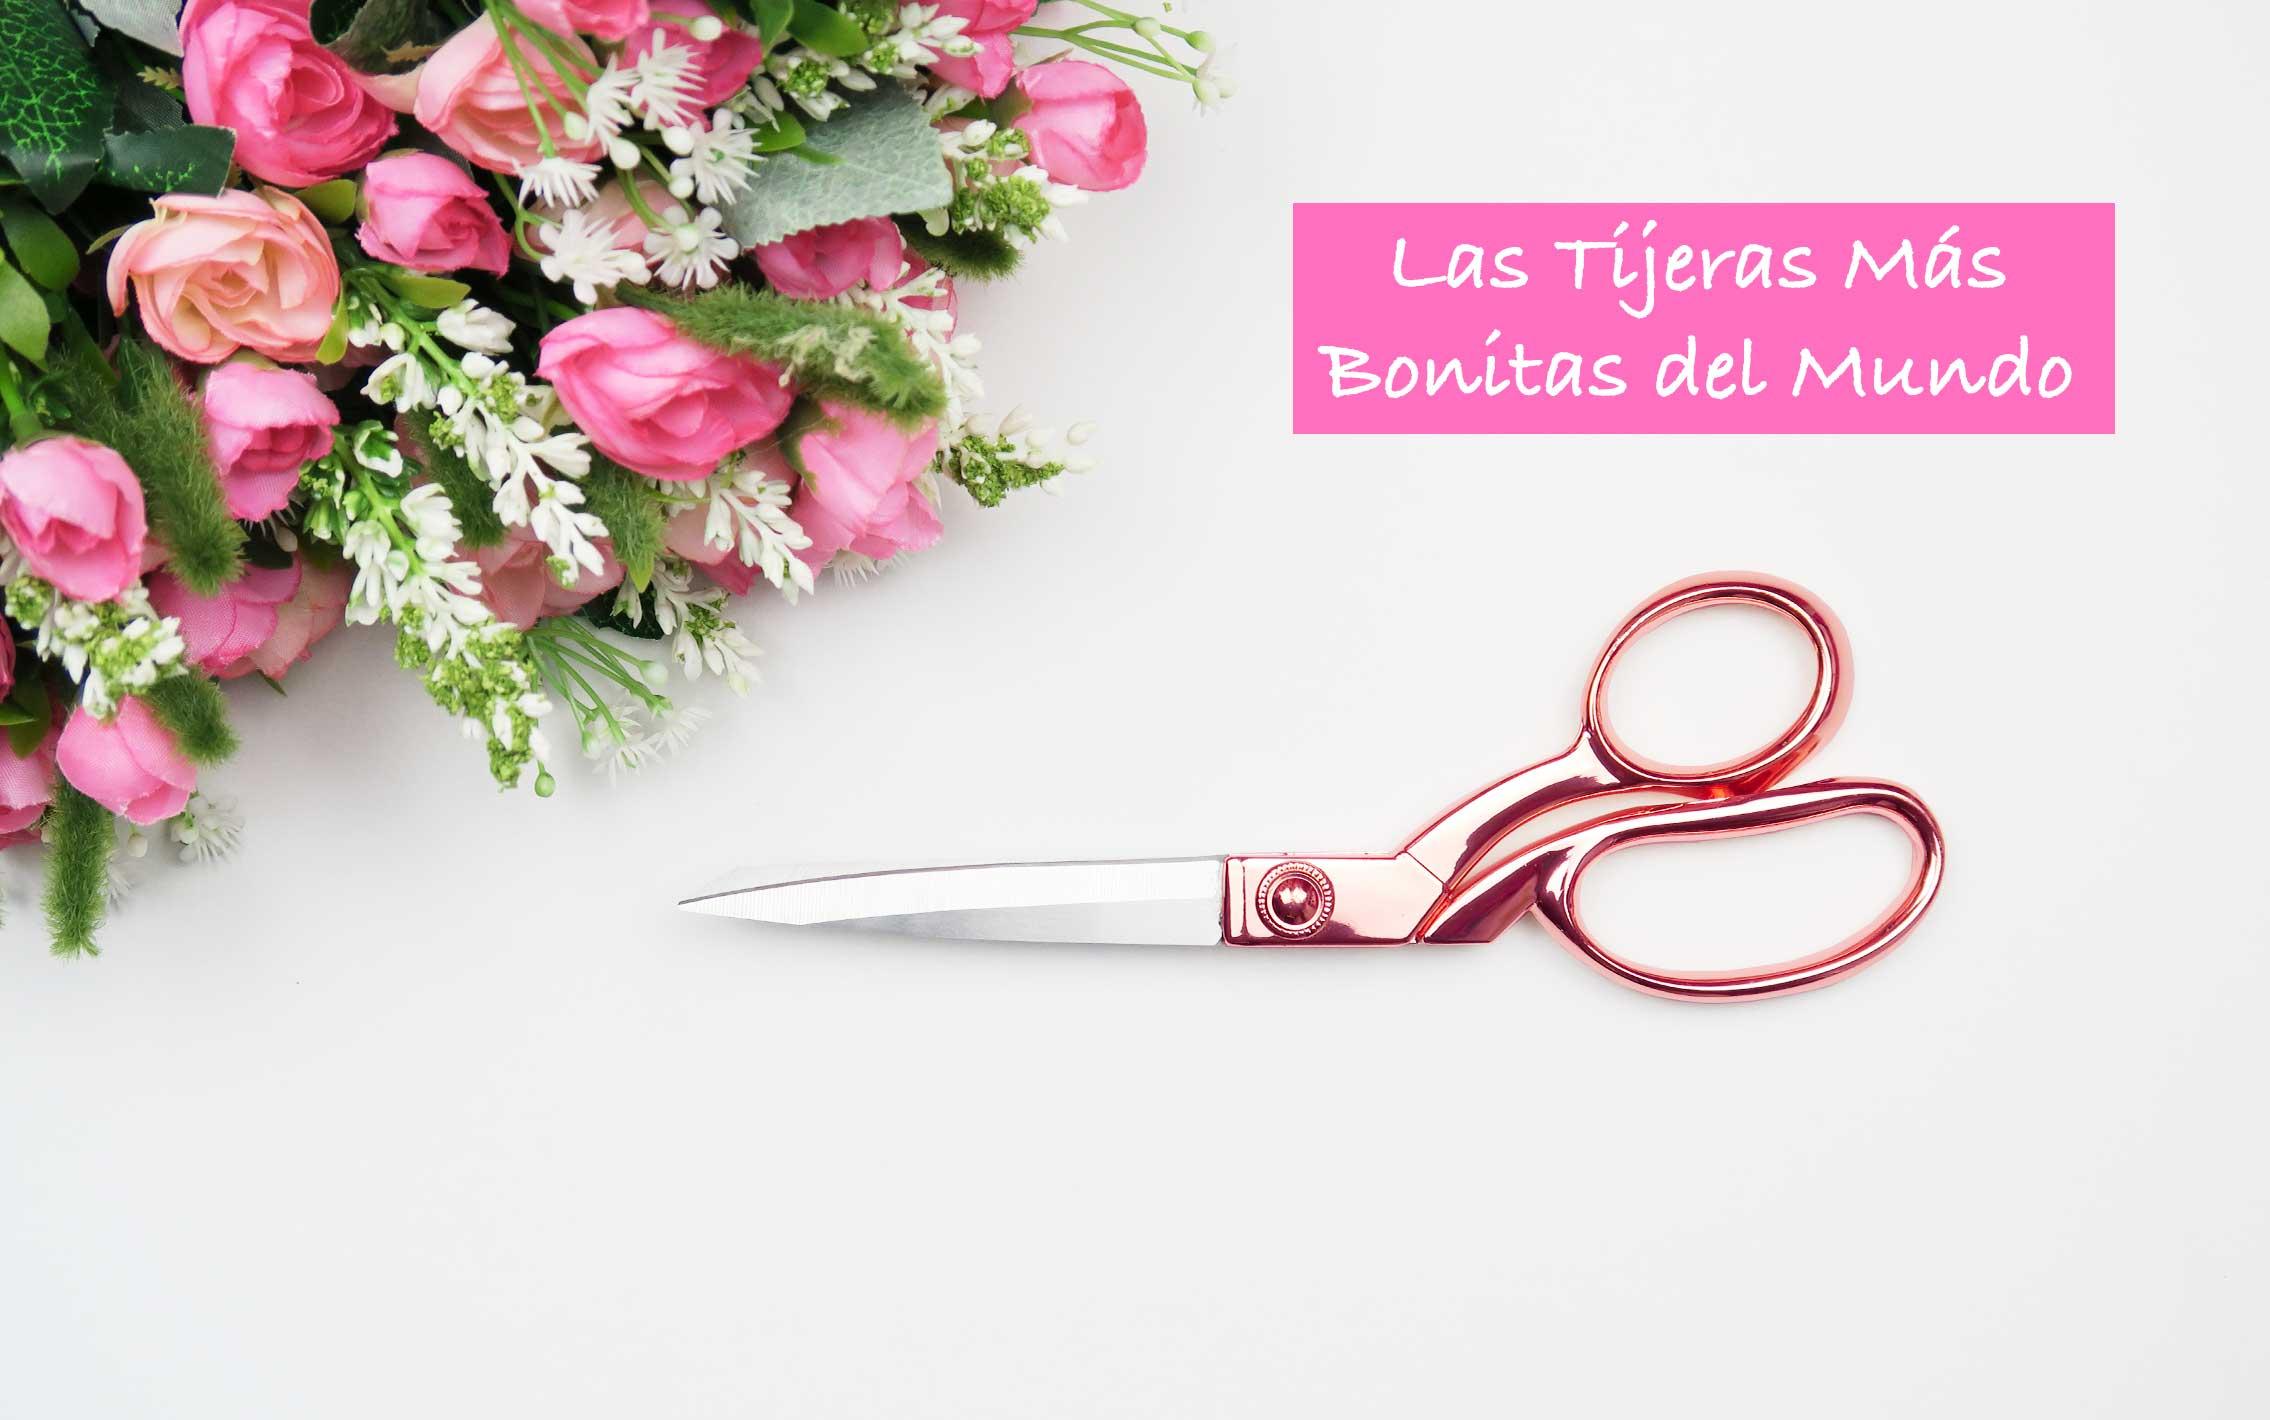 las-tijeras-mas-bonitas-del-mundo-skarlett-costura-carrusel